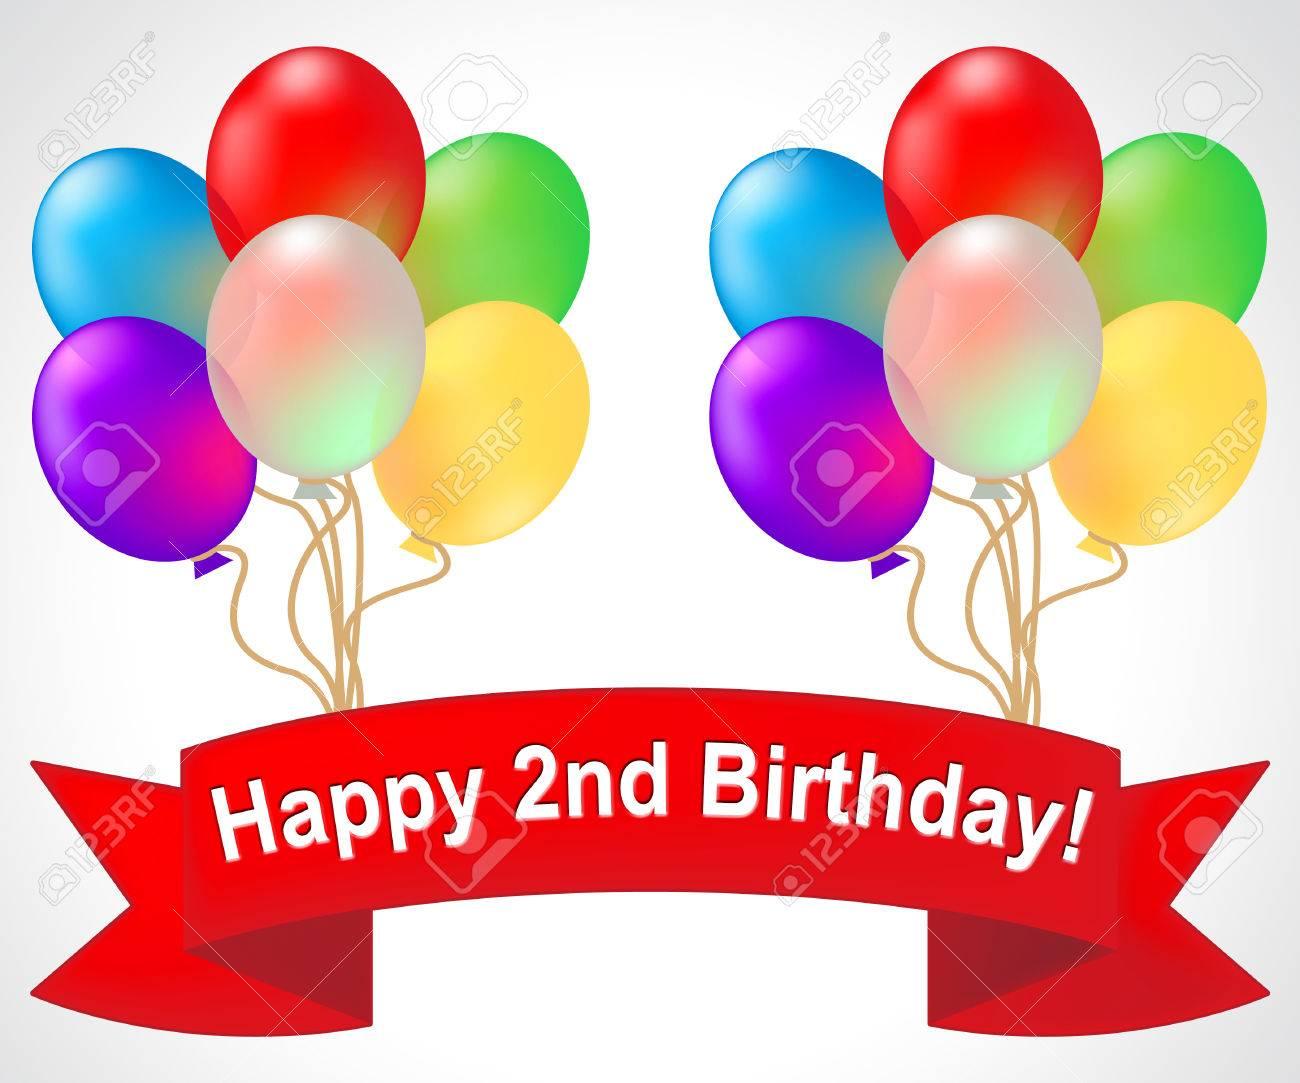 Happy Second Birthday Balloons Means Congratulation Celebration 3d Illustration Stock